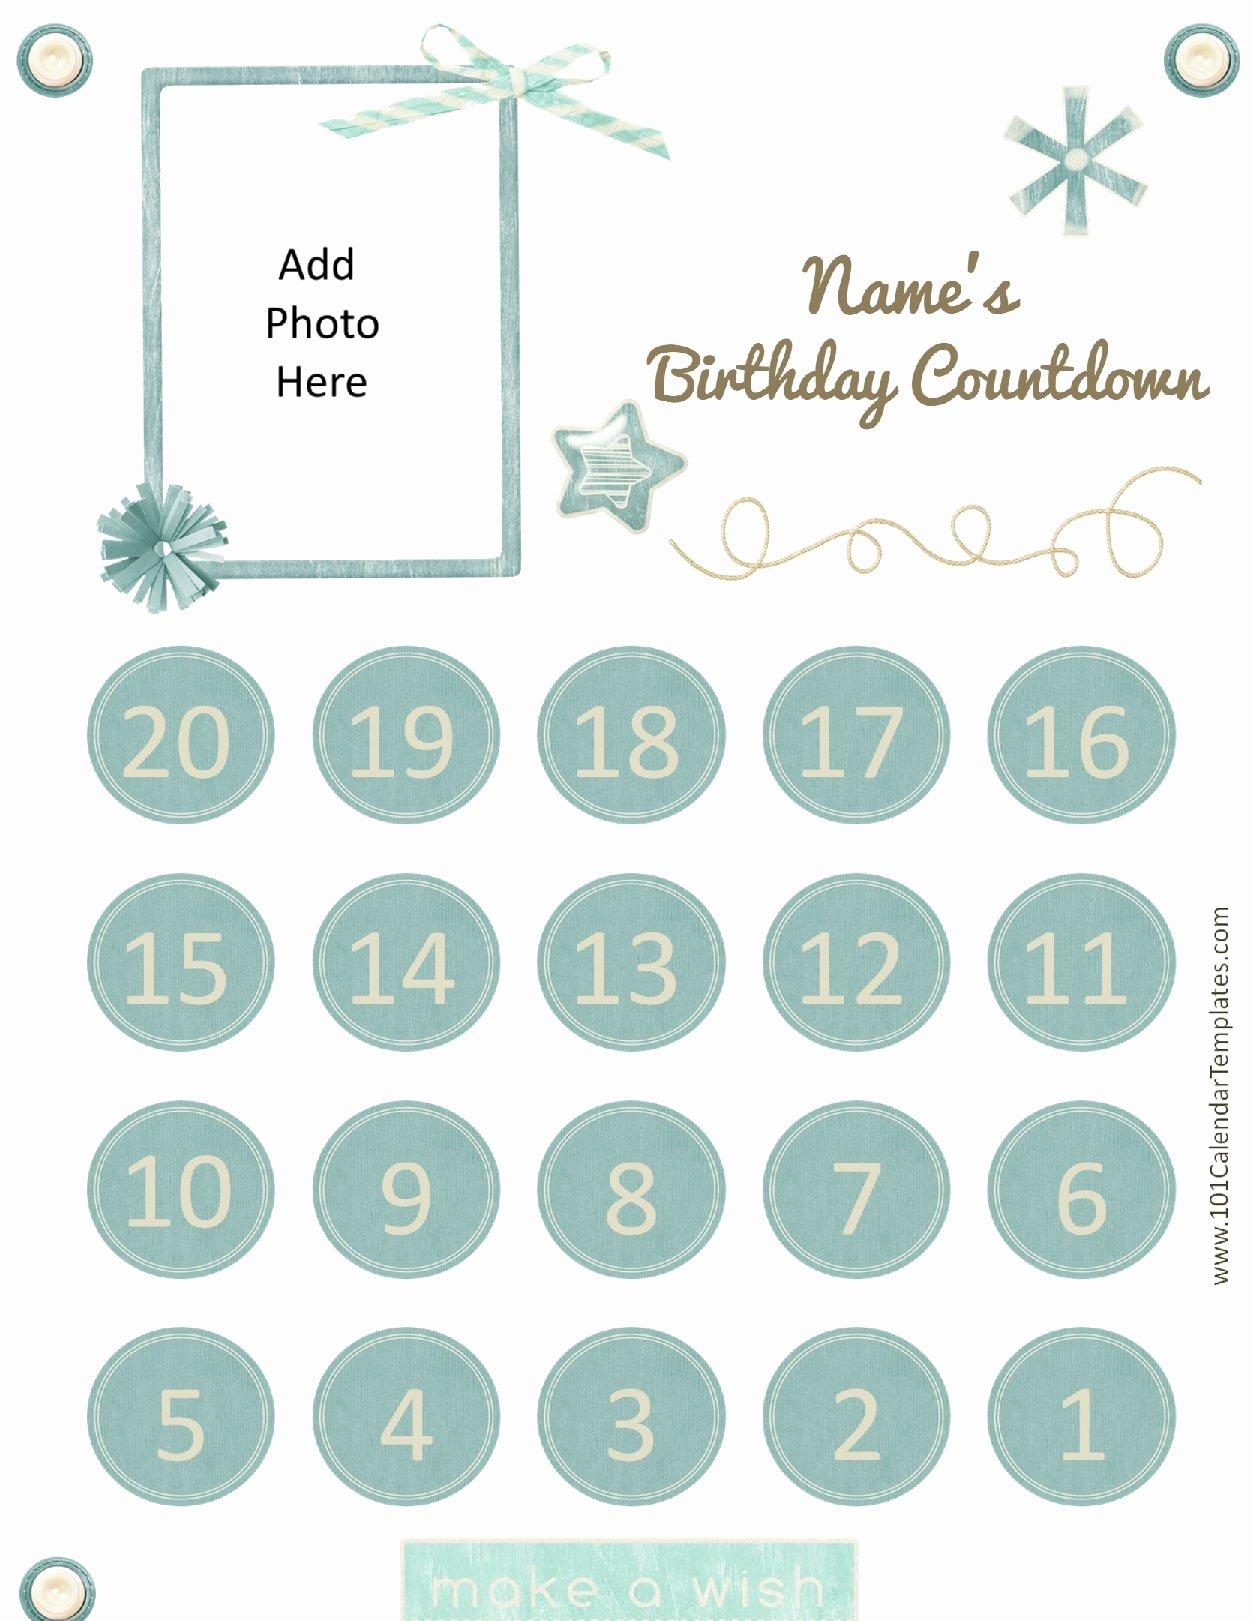 Printable Countdown Calendar Template Unique Printable Calendar Countdown